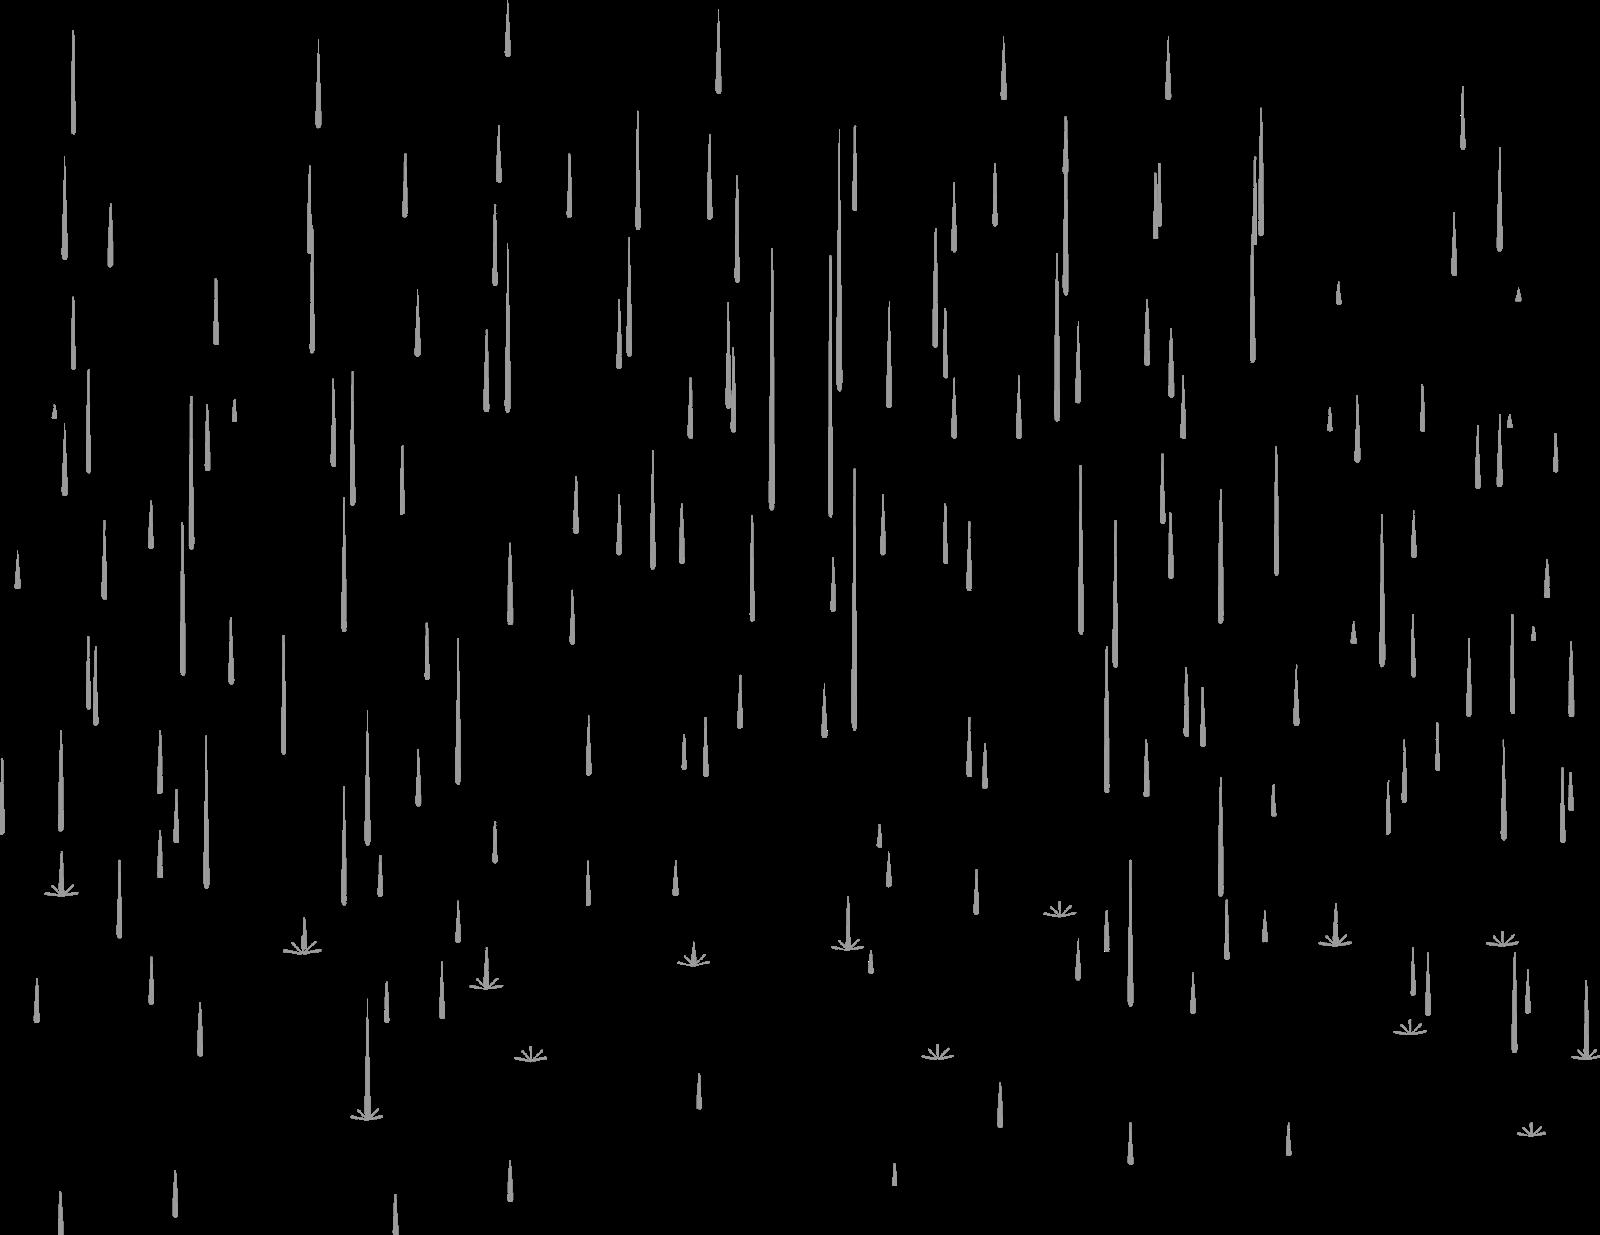 Rain PNG Image - Rain Transparent Free Download - PNG Sector | 1600 x 1235 png 85kB